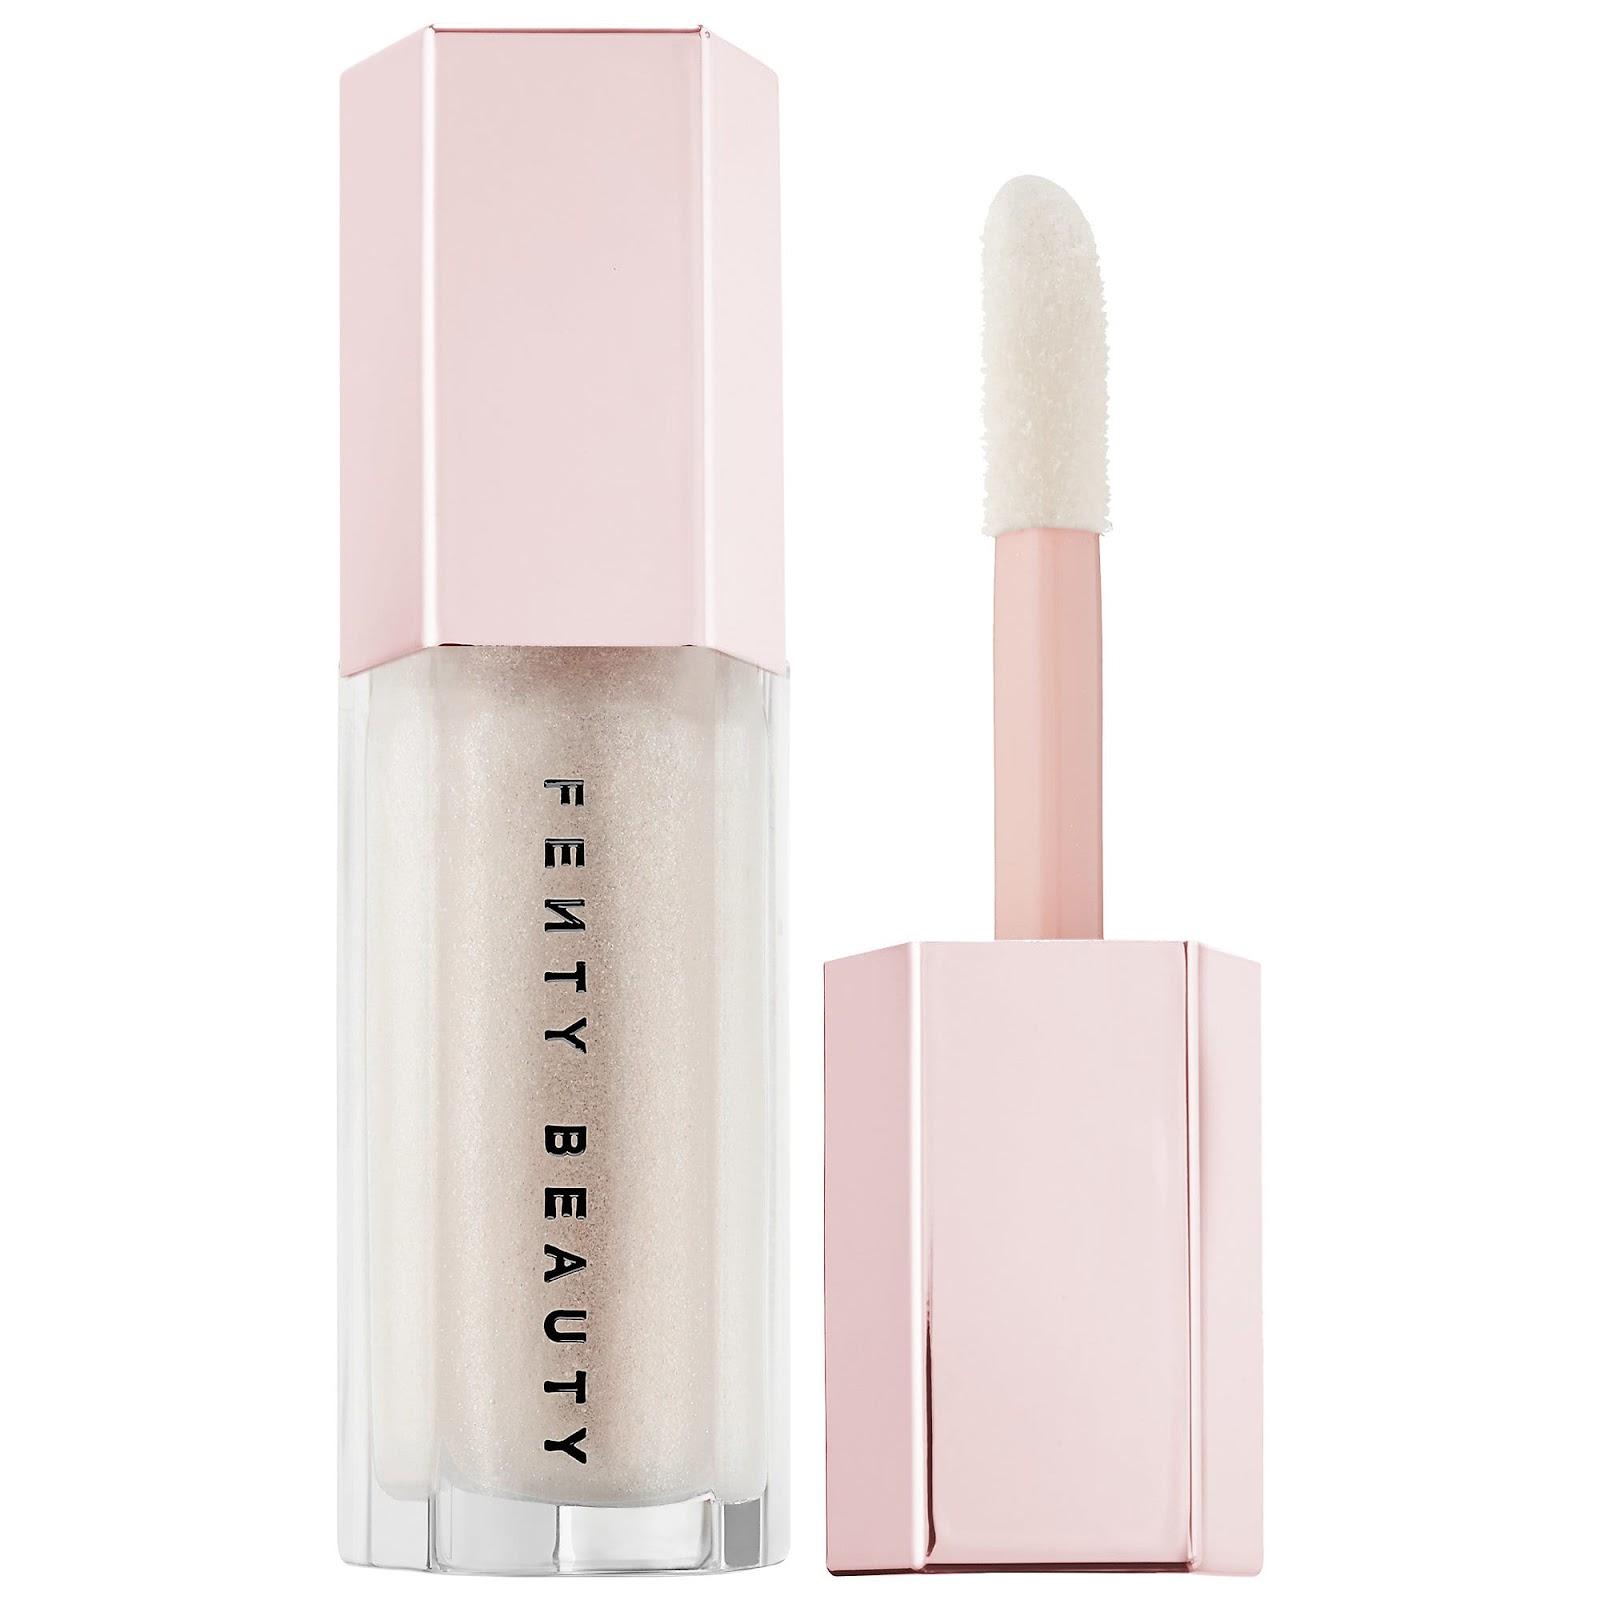 Gloss Bomb Universal Lip Luminizer in Diamond Milk Review